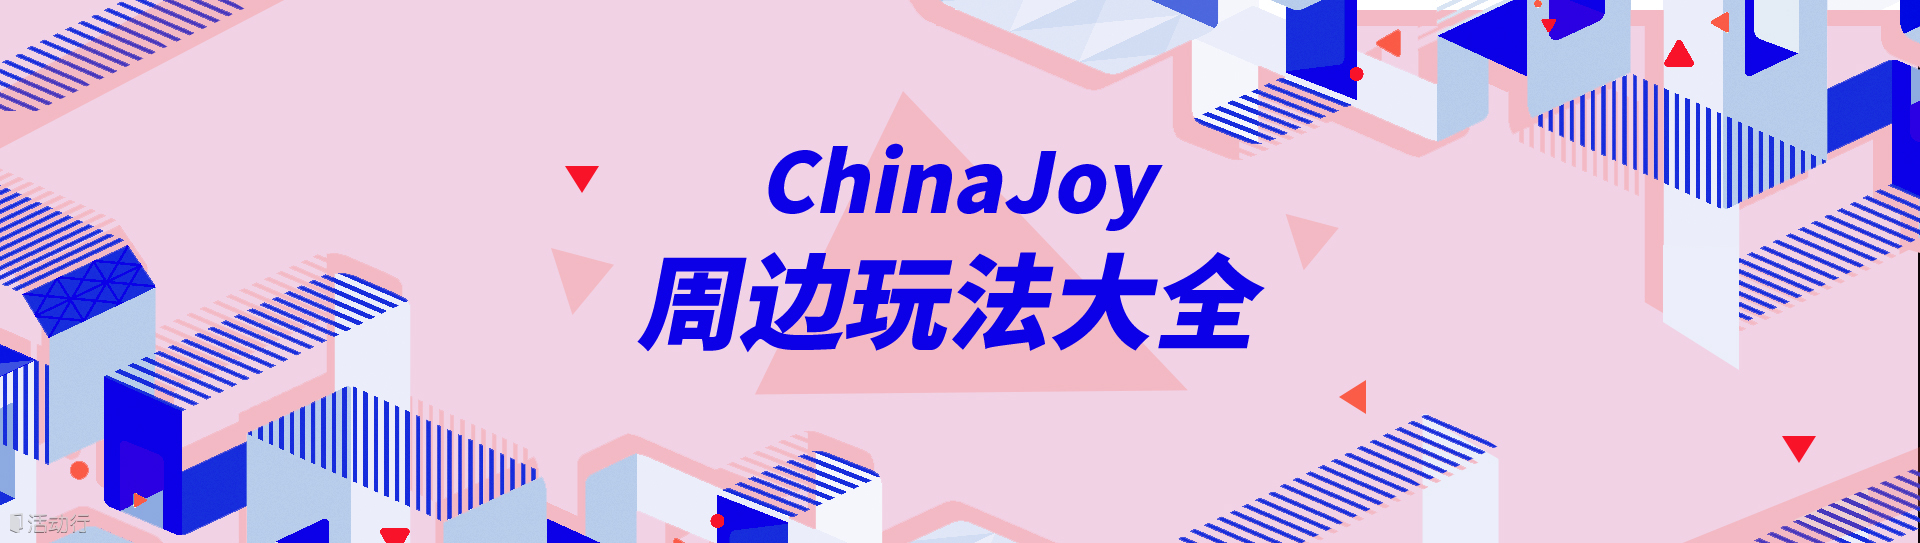 ChinaJoy周边玩法大全